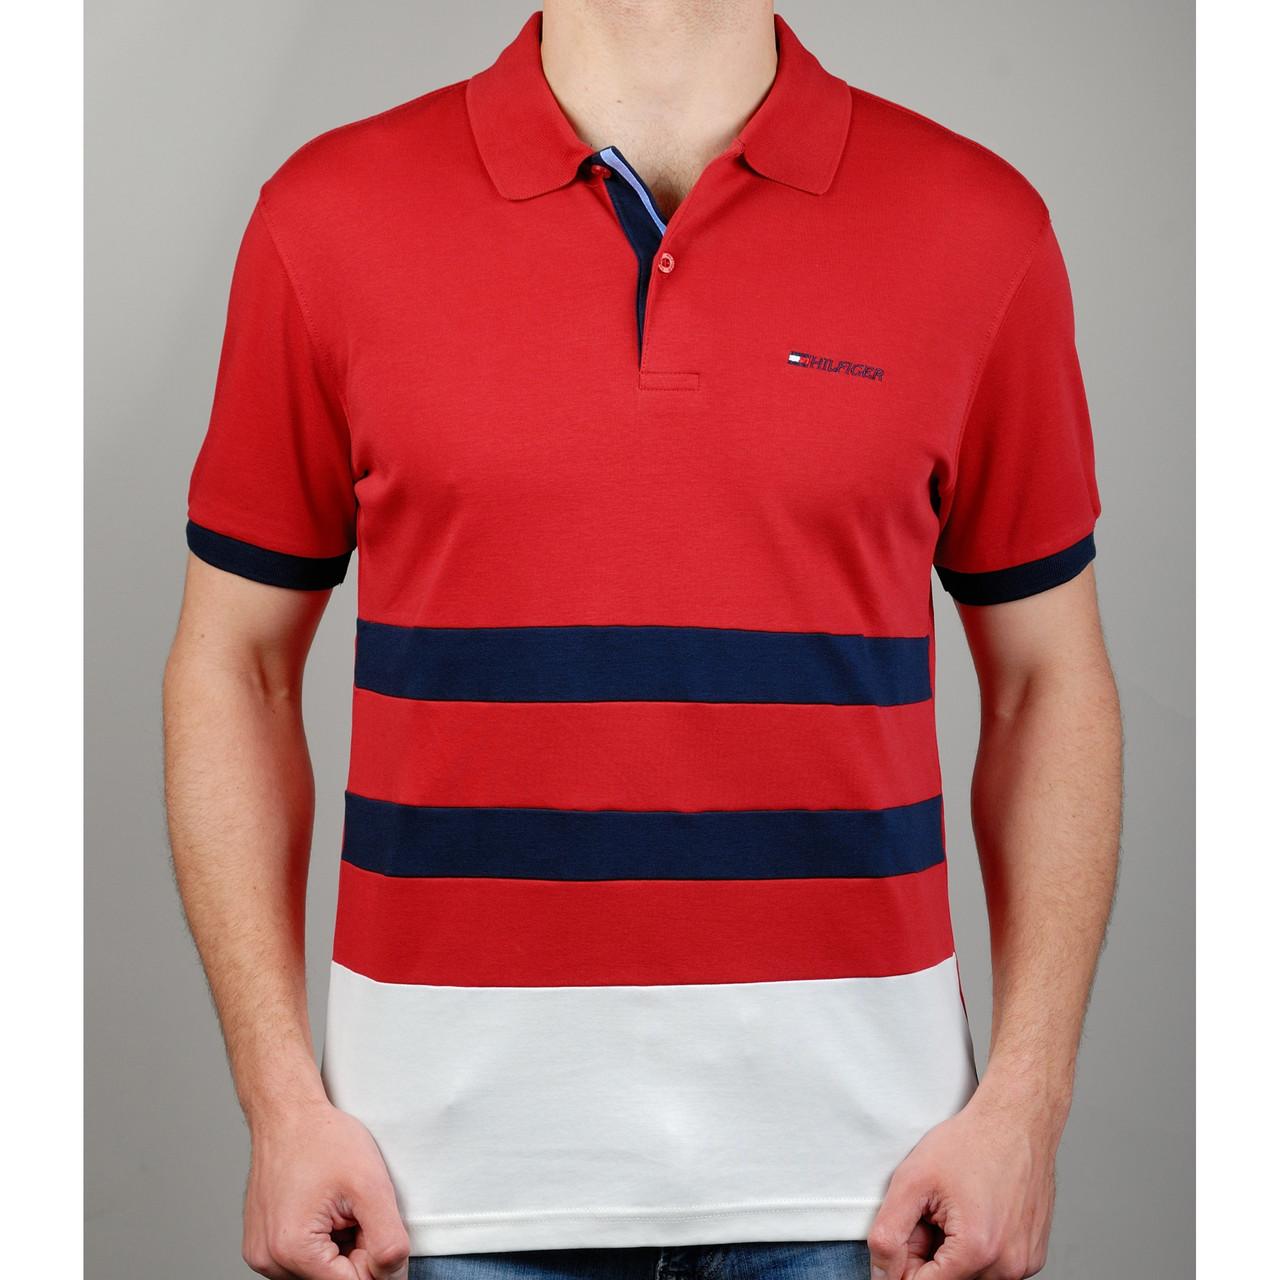 Мужская футболка поло TOMMY HILFIGER 20869 красная - Брендовая одежда от  интернет-магазина «Trendy 4f28937d19199